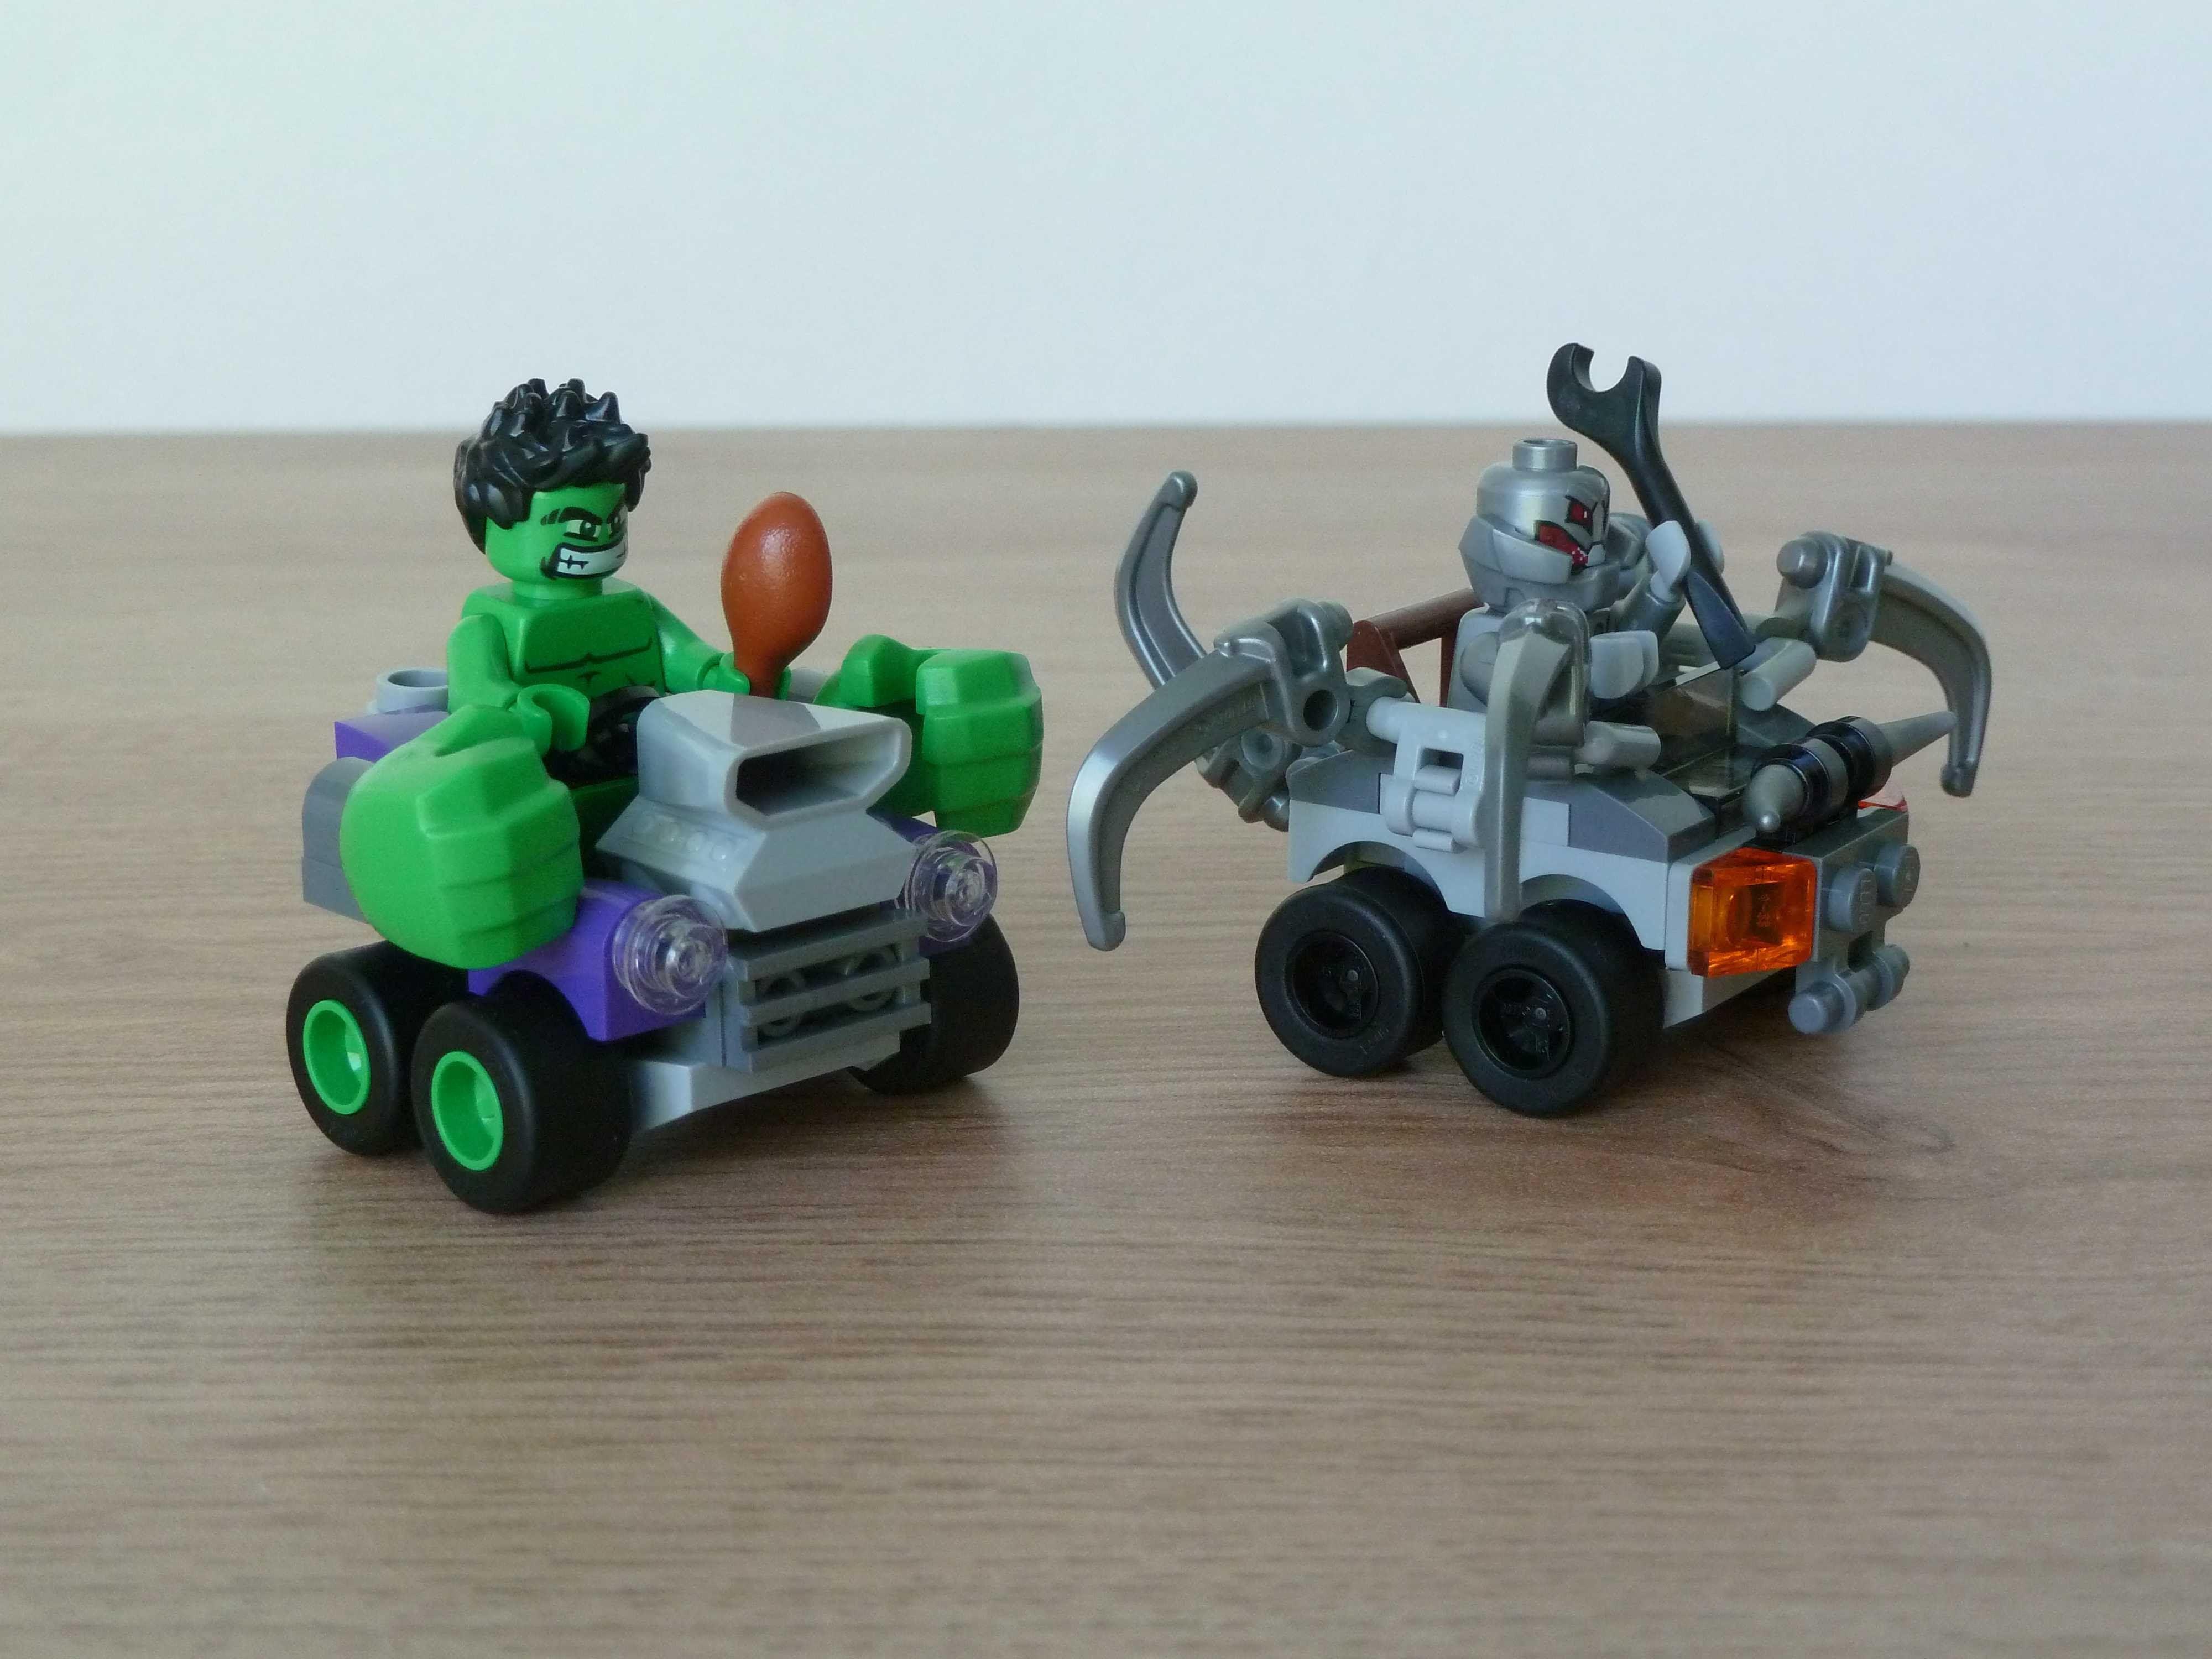 Lego Marvel Super Heroes 76066 Mighty Micros Hulk Vs Ultron 76064 Spider Man Green Goblin